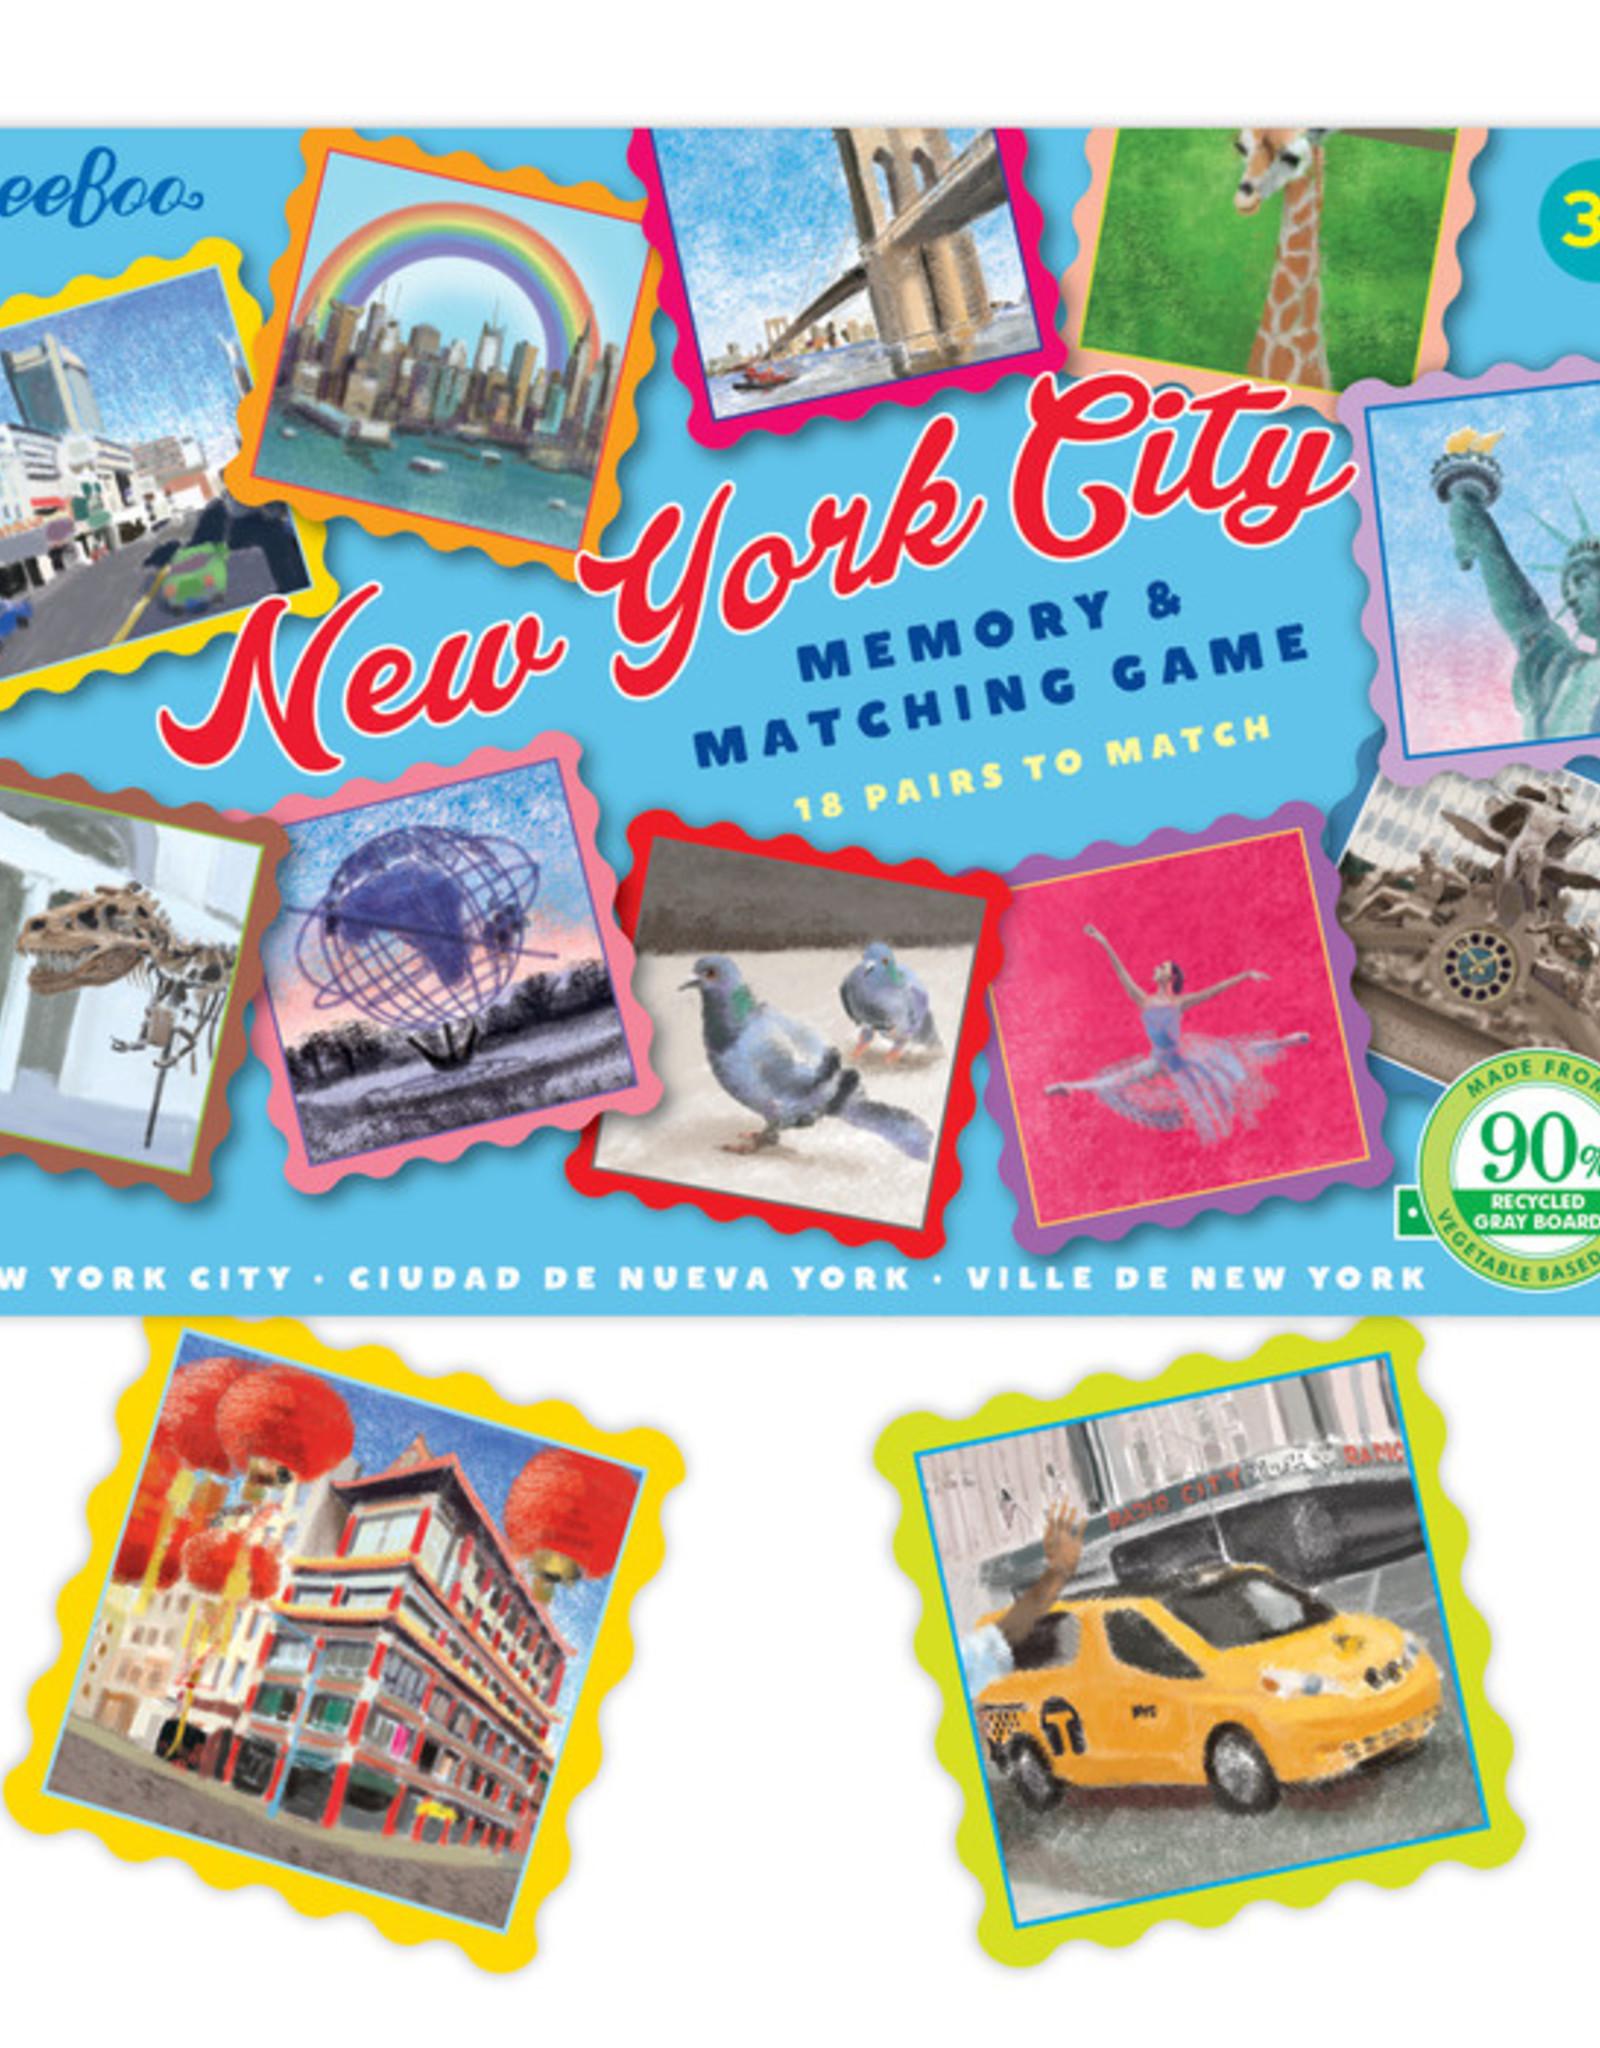 eeBoo NYC Little Matching Game: Memory